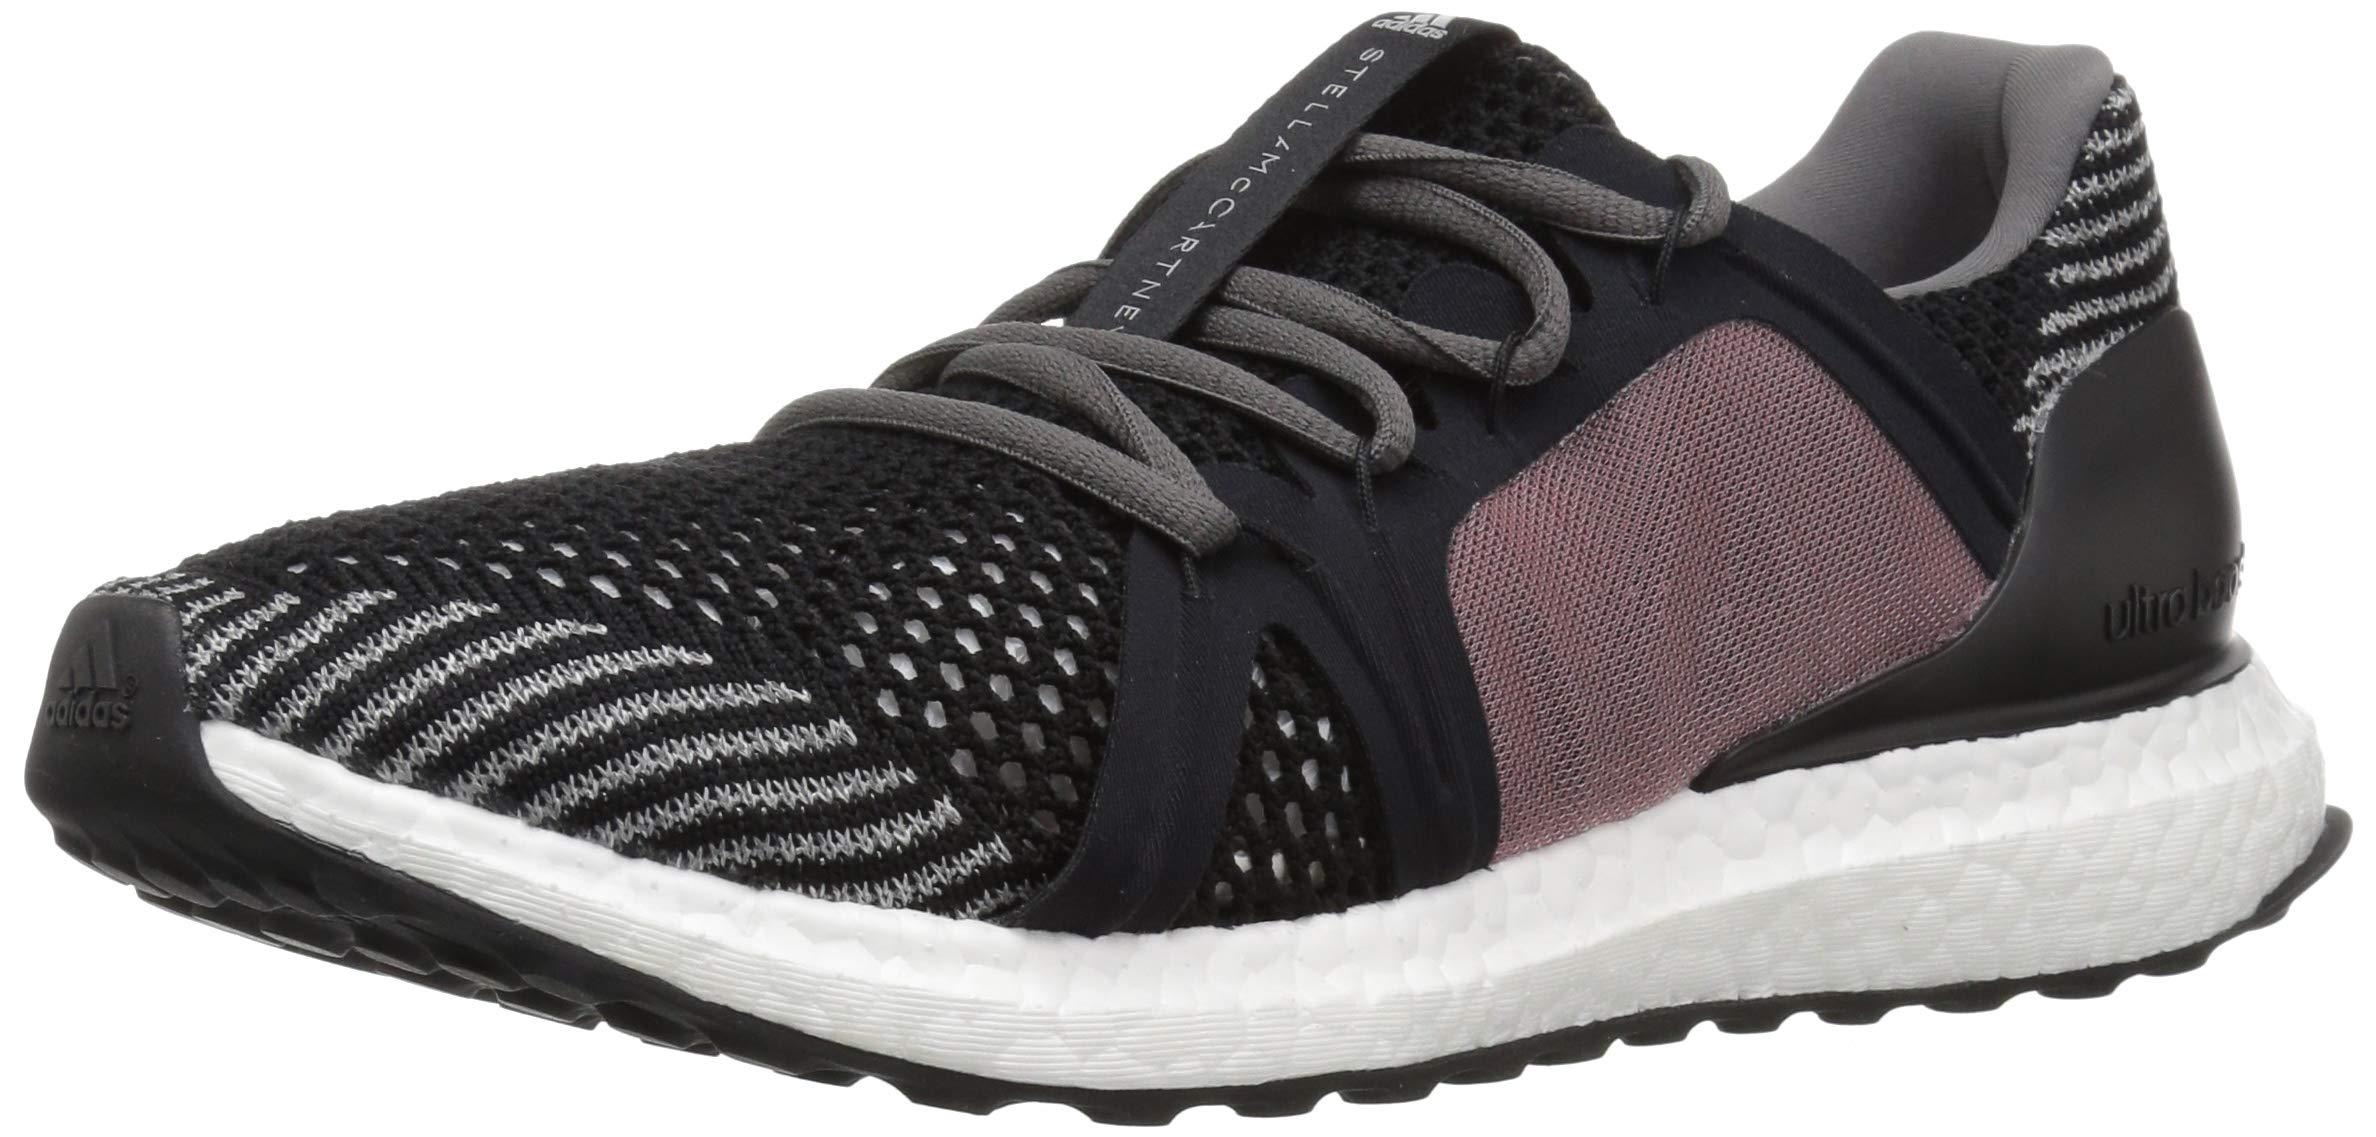 adidas Women's Ultraboost, black/smoked pink/core red, 5 M US